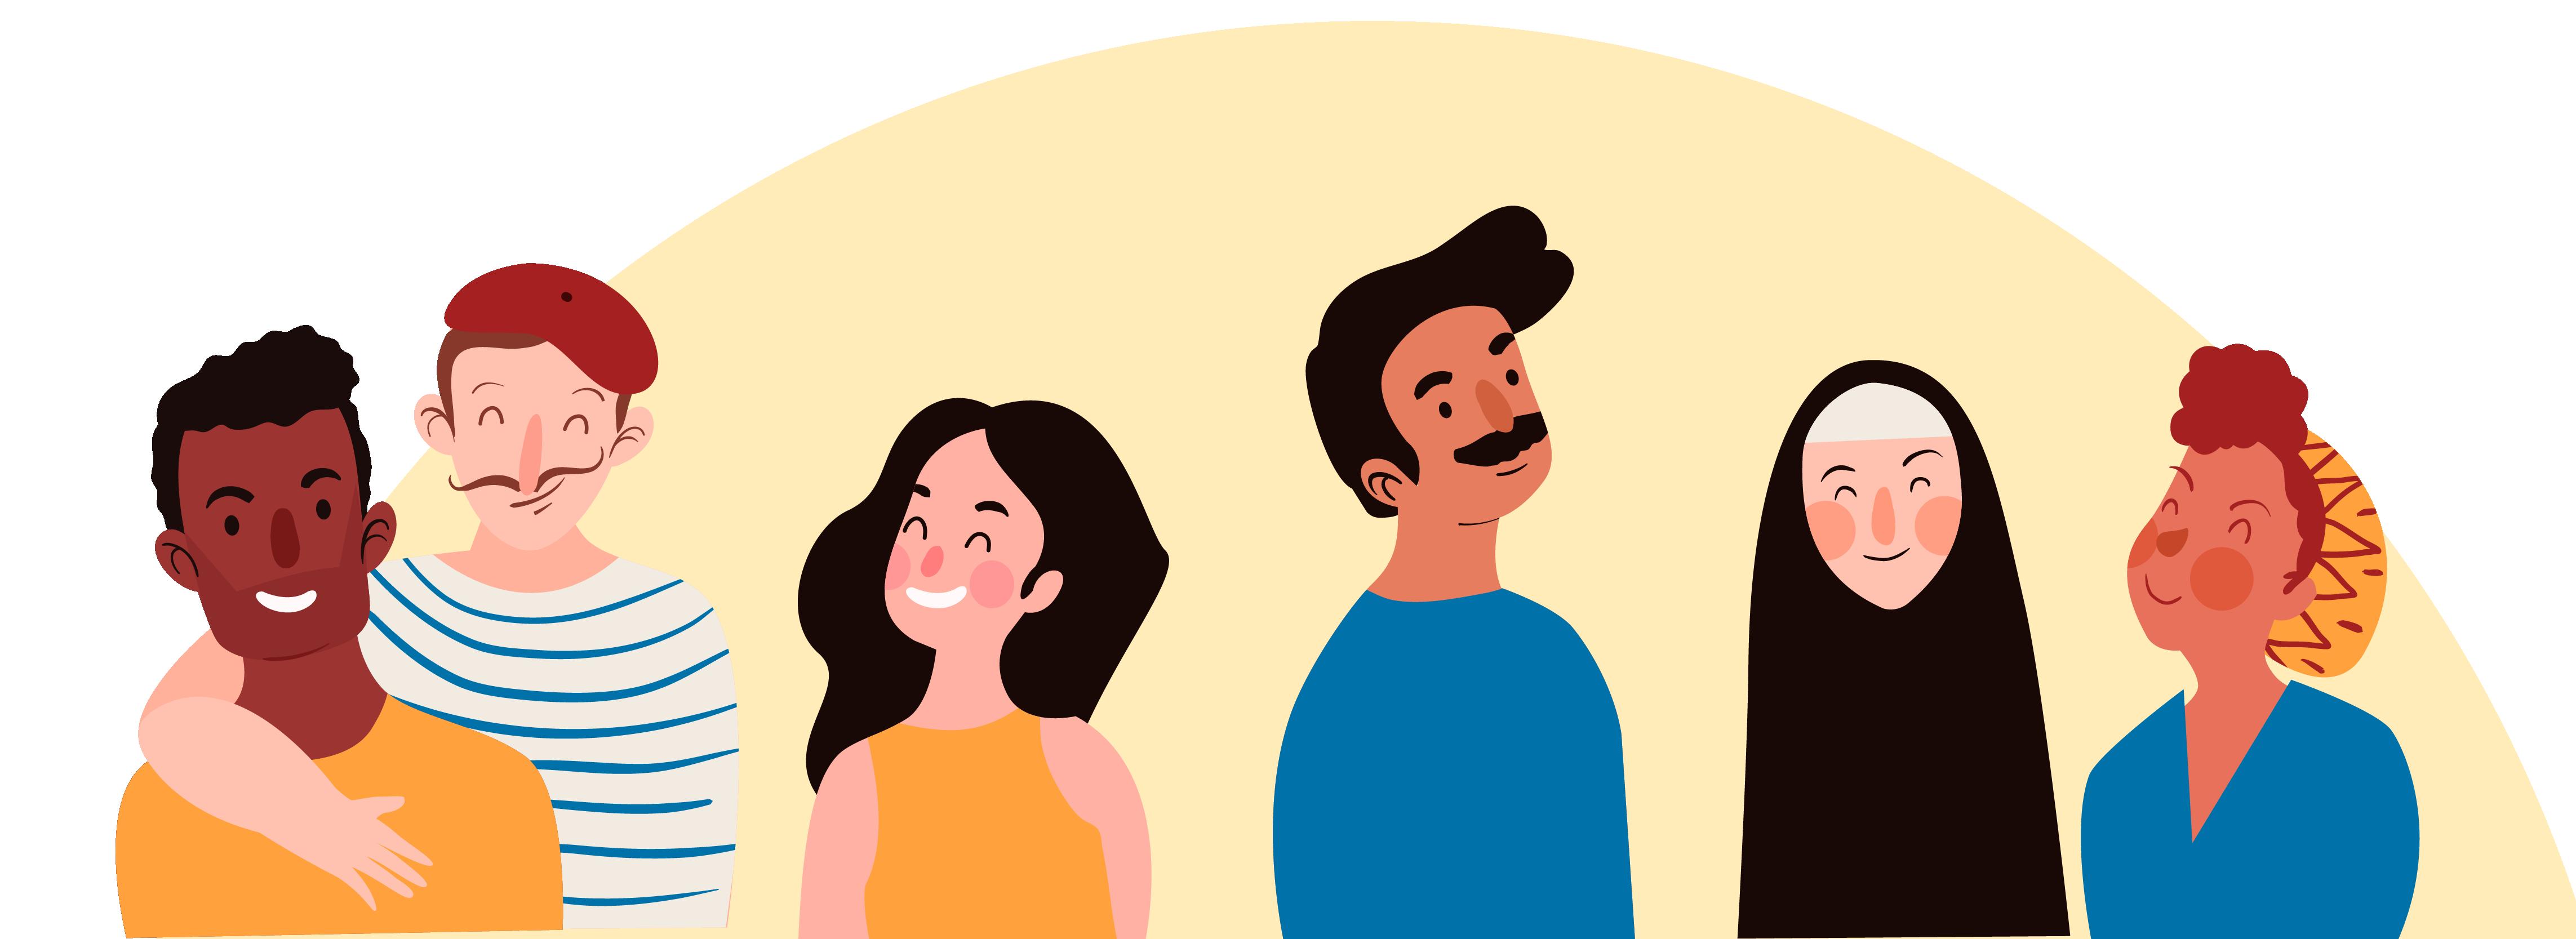 Diversity and Inclusiveness Recruiting Essentials-01